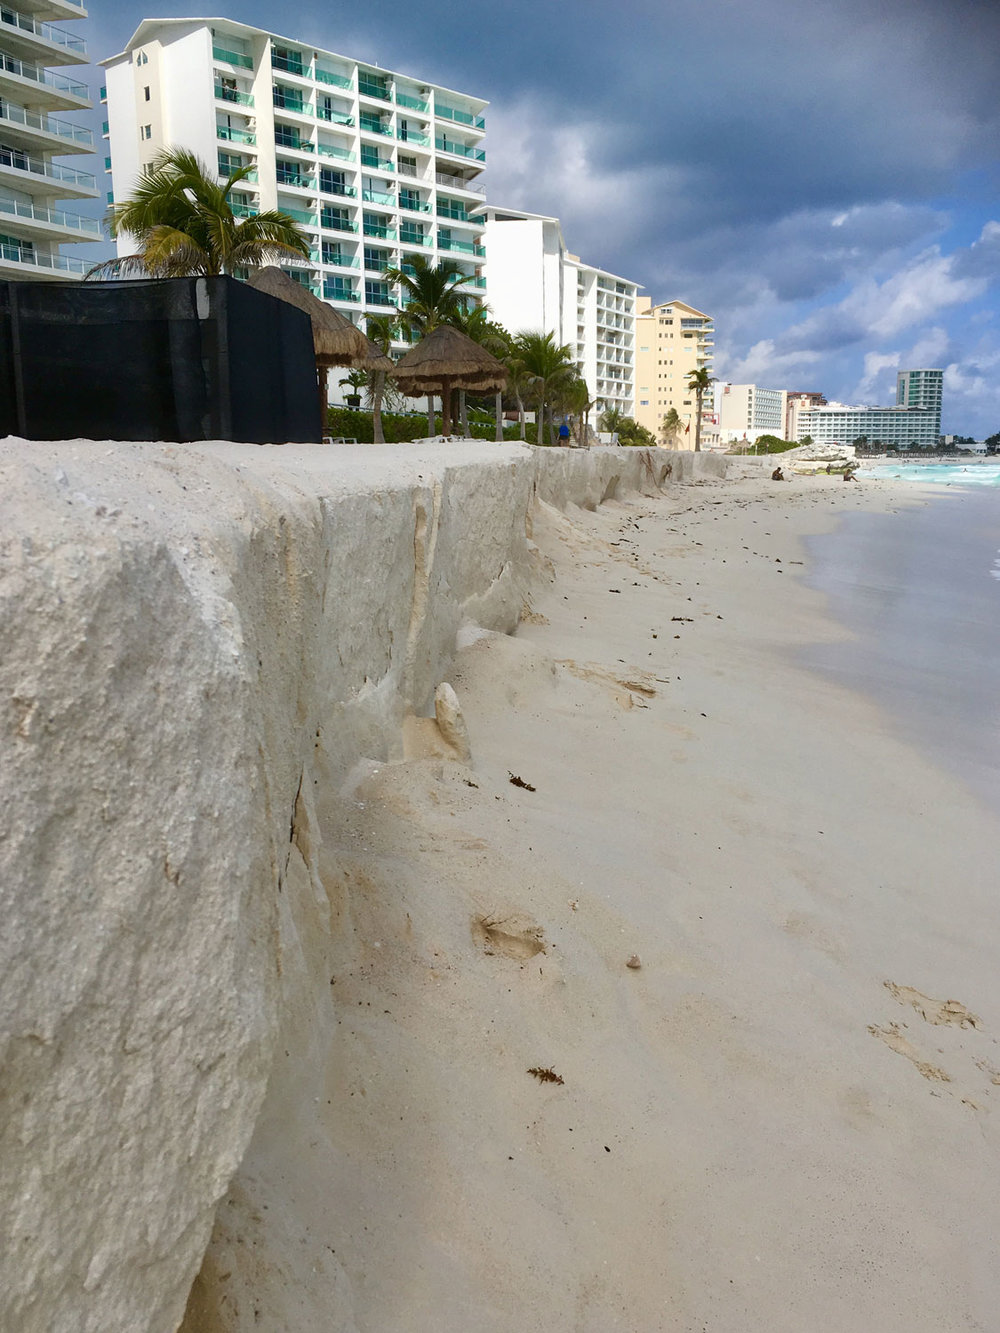 Hammocks_and_Ruins_Things_To_Do_Cancun_Explore_Riviera_Maya_Mexico_Cancun_Beaches_Playa_Chacmul_25.jpg